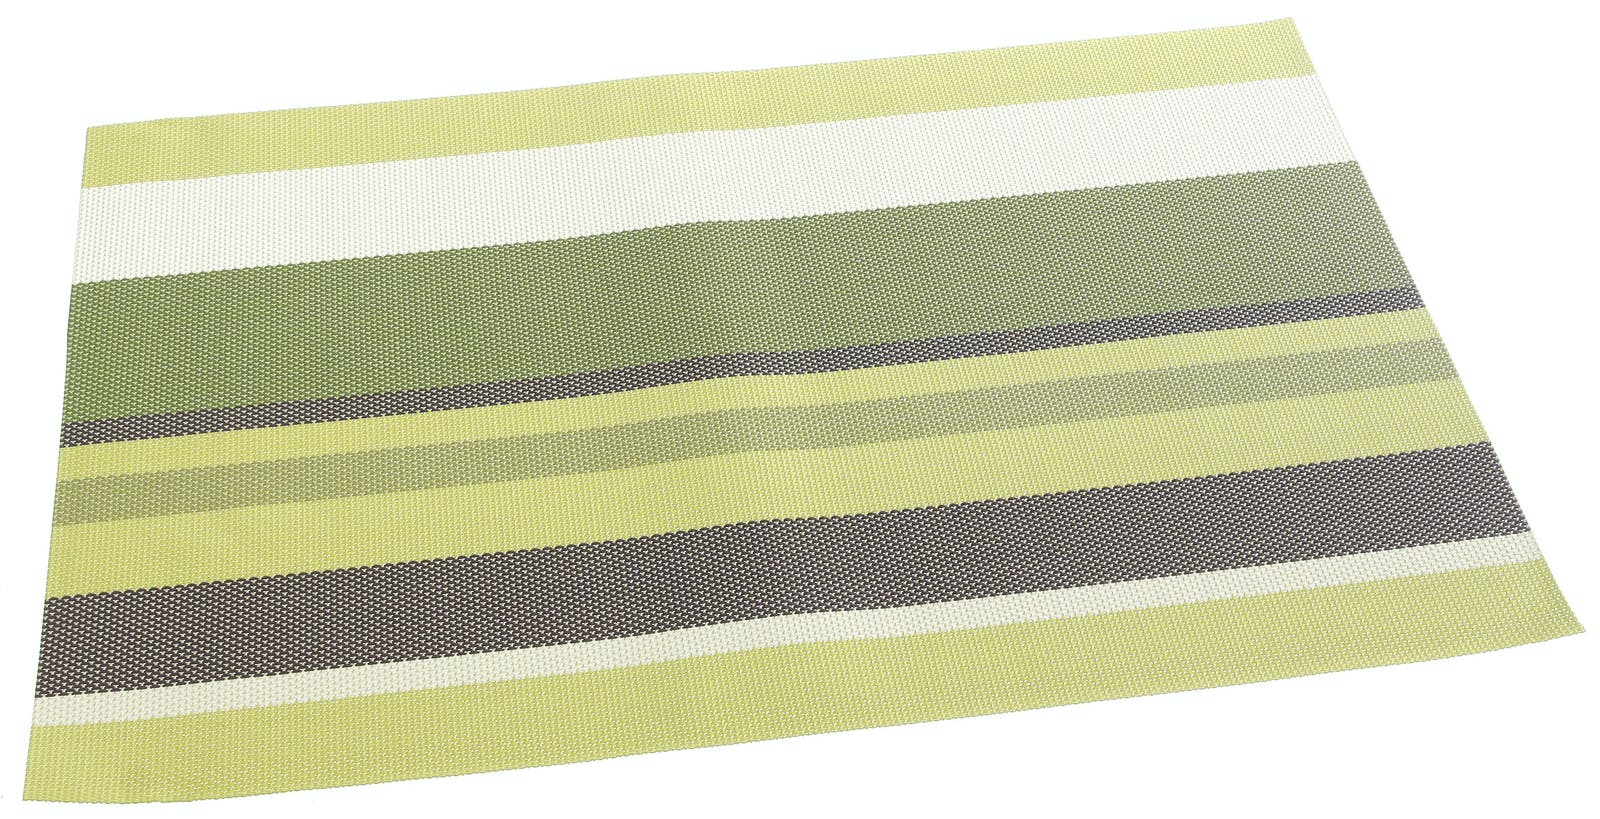 Set de table texaline rectangle 50 x 35 cm Bayadères Vert, Marron, Blanc